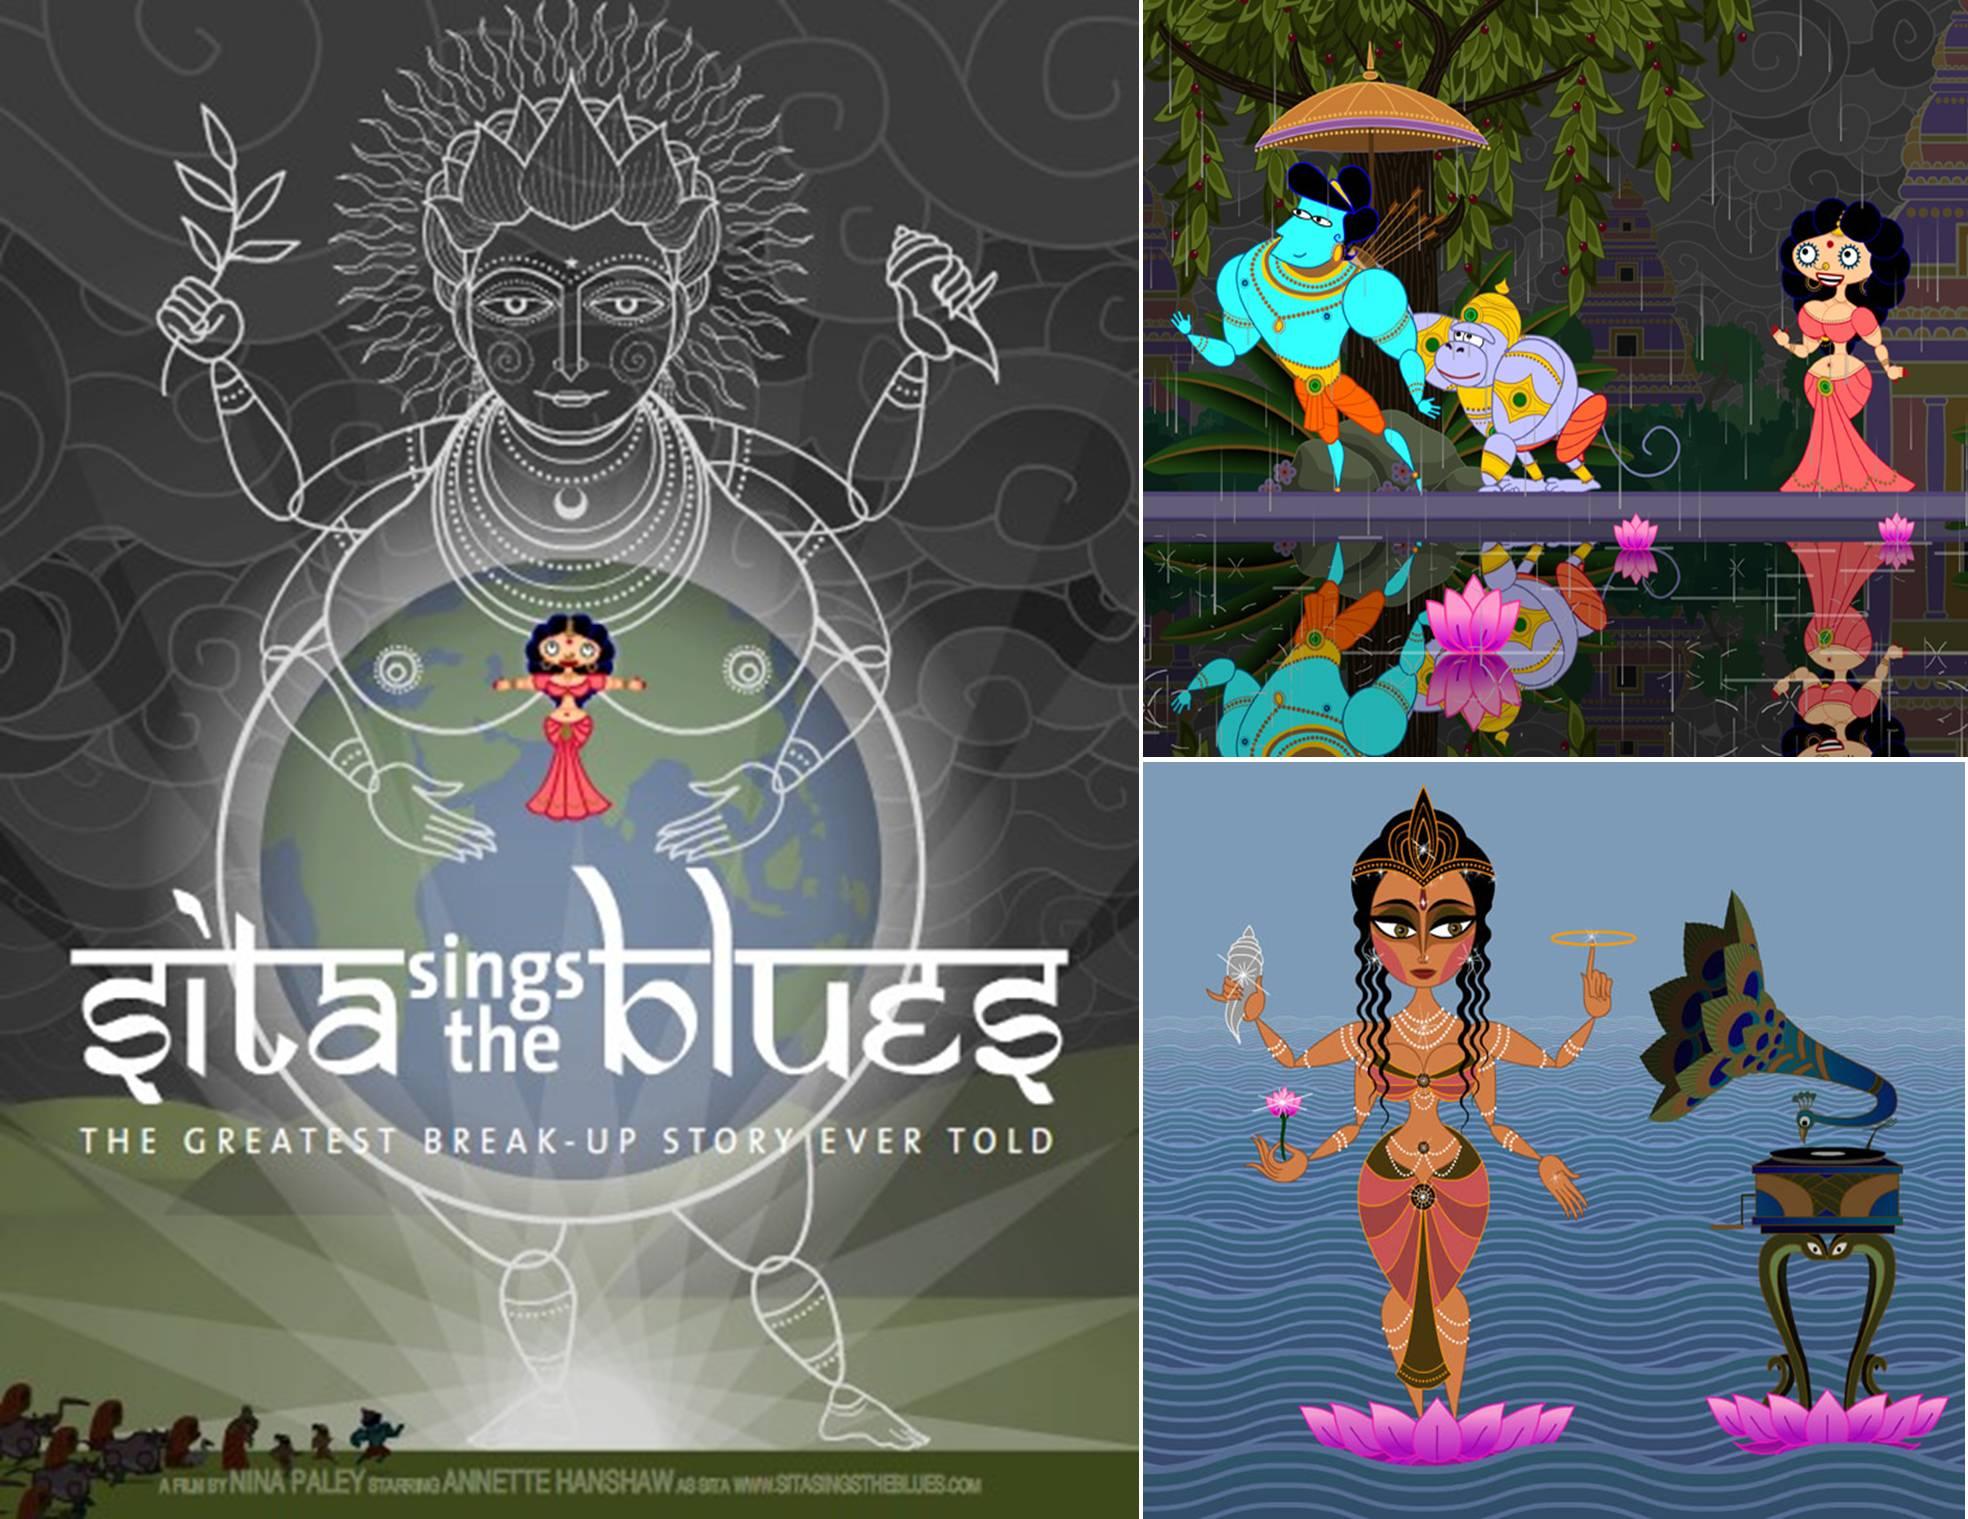 Sita collage